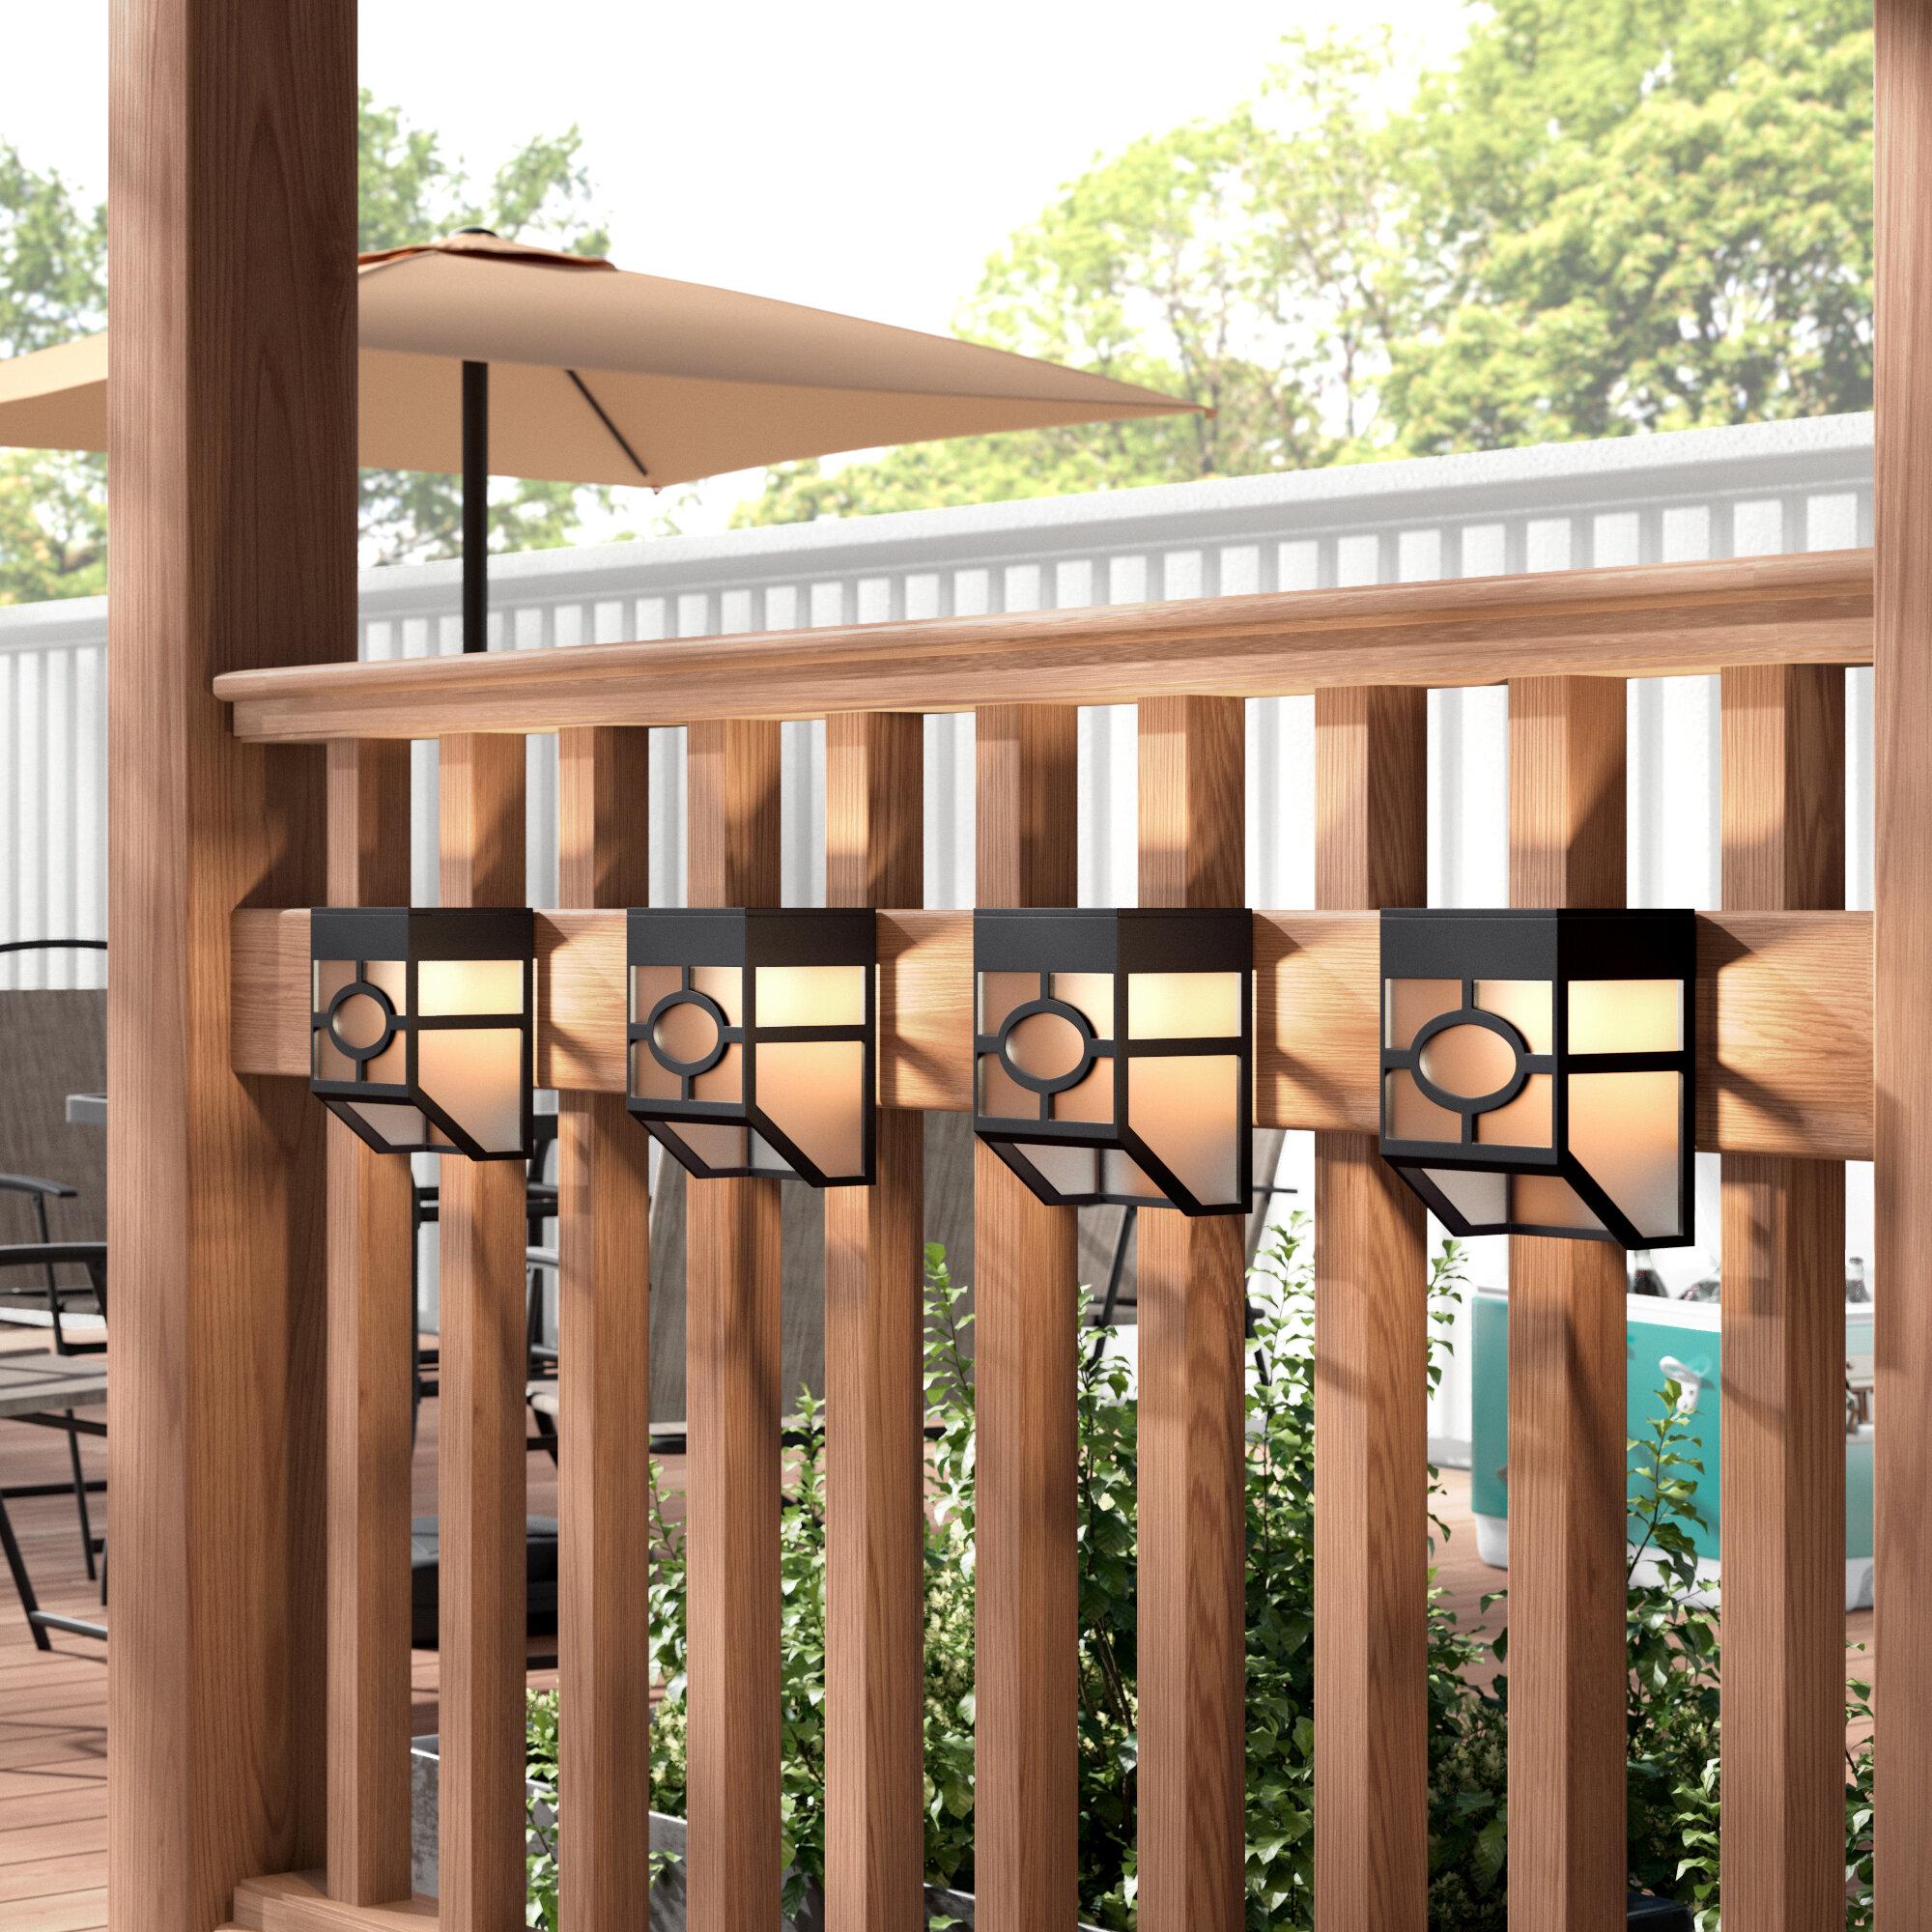 Ebern Designs Cullens Solar Powered Led Deck Light Pack Reviews Wayfair